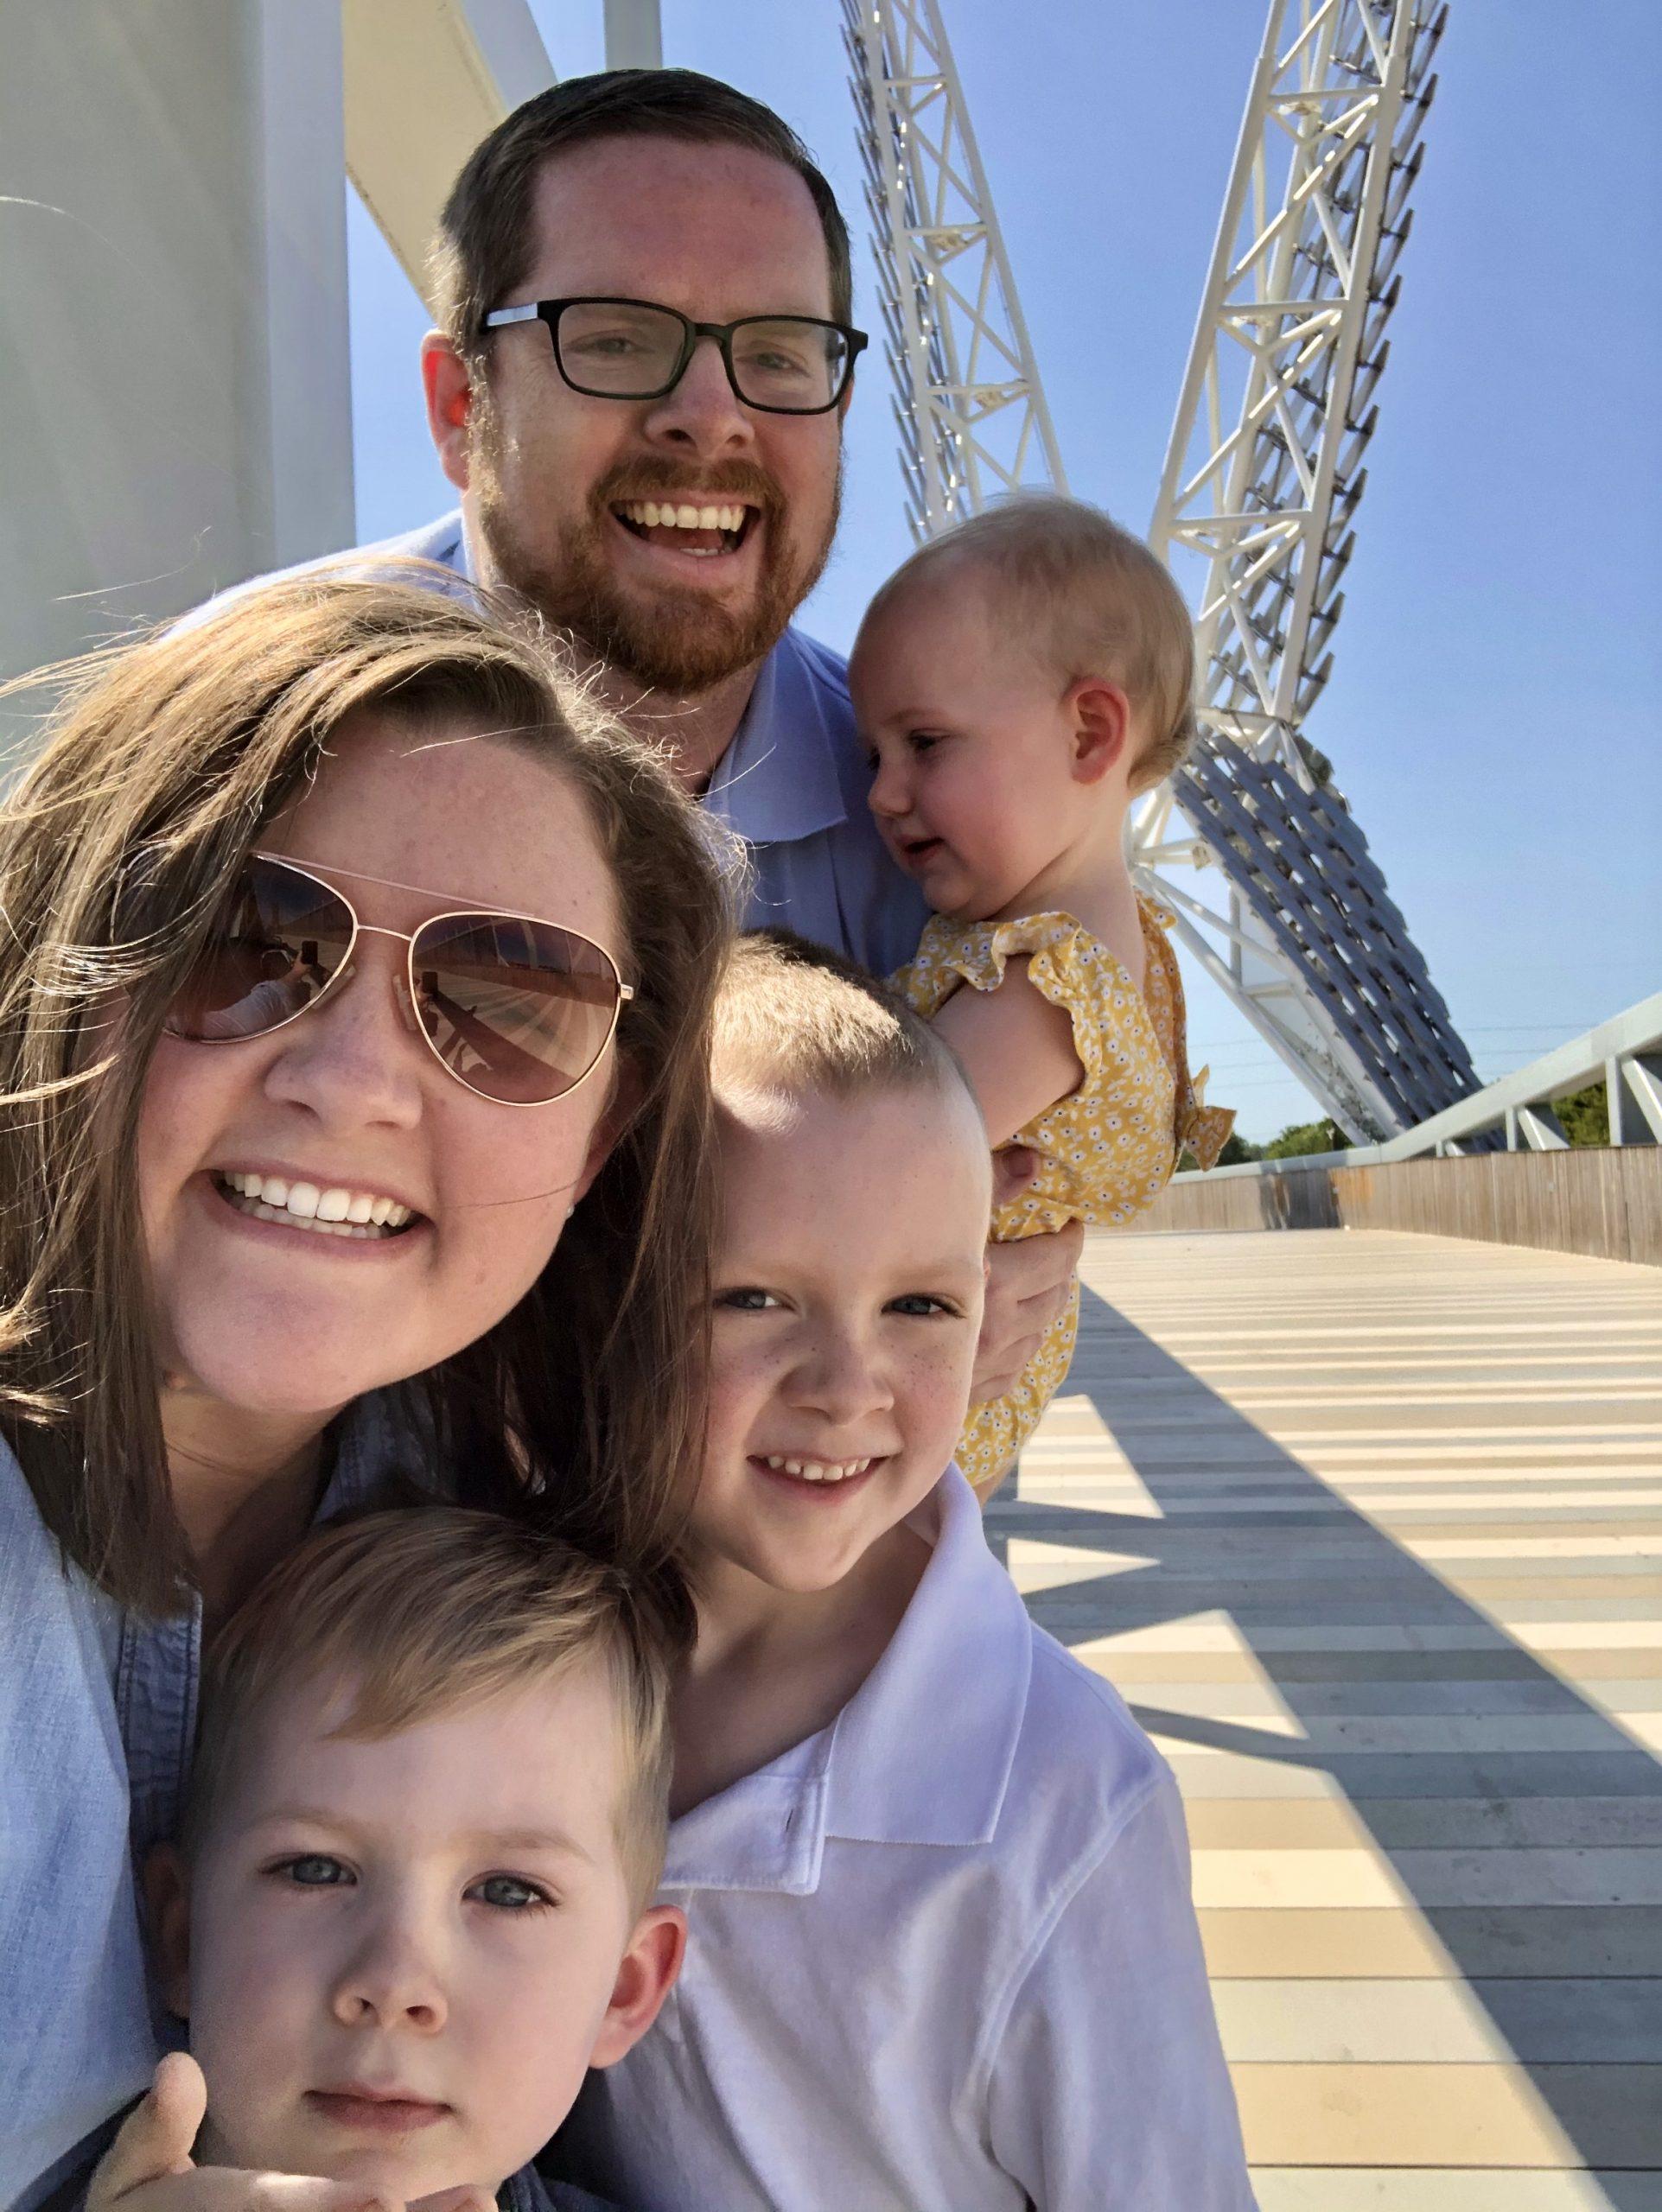 Selfie at Skydance Bridge in OKC